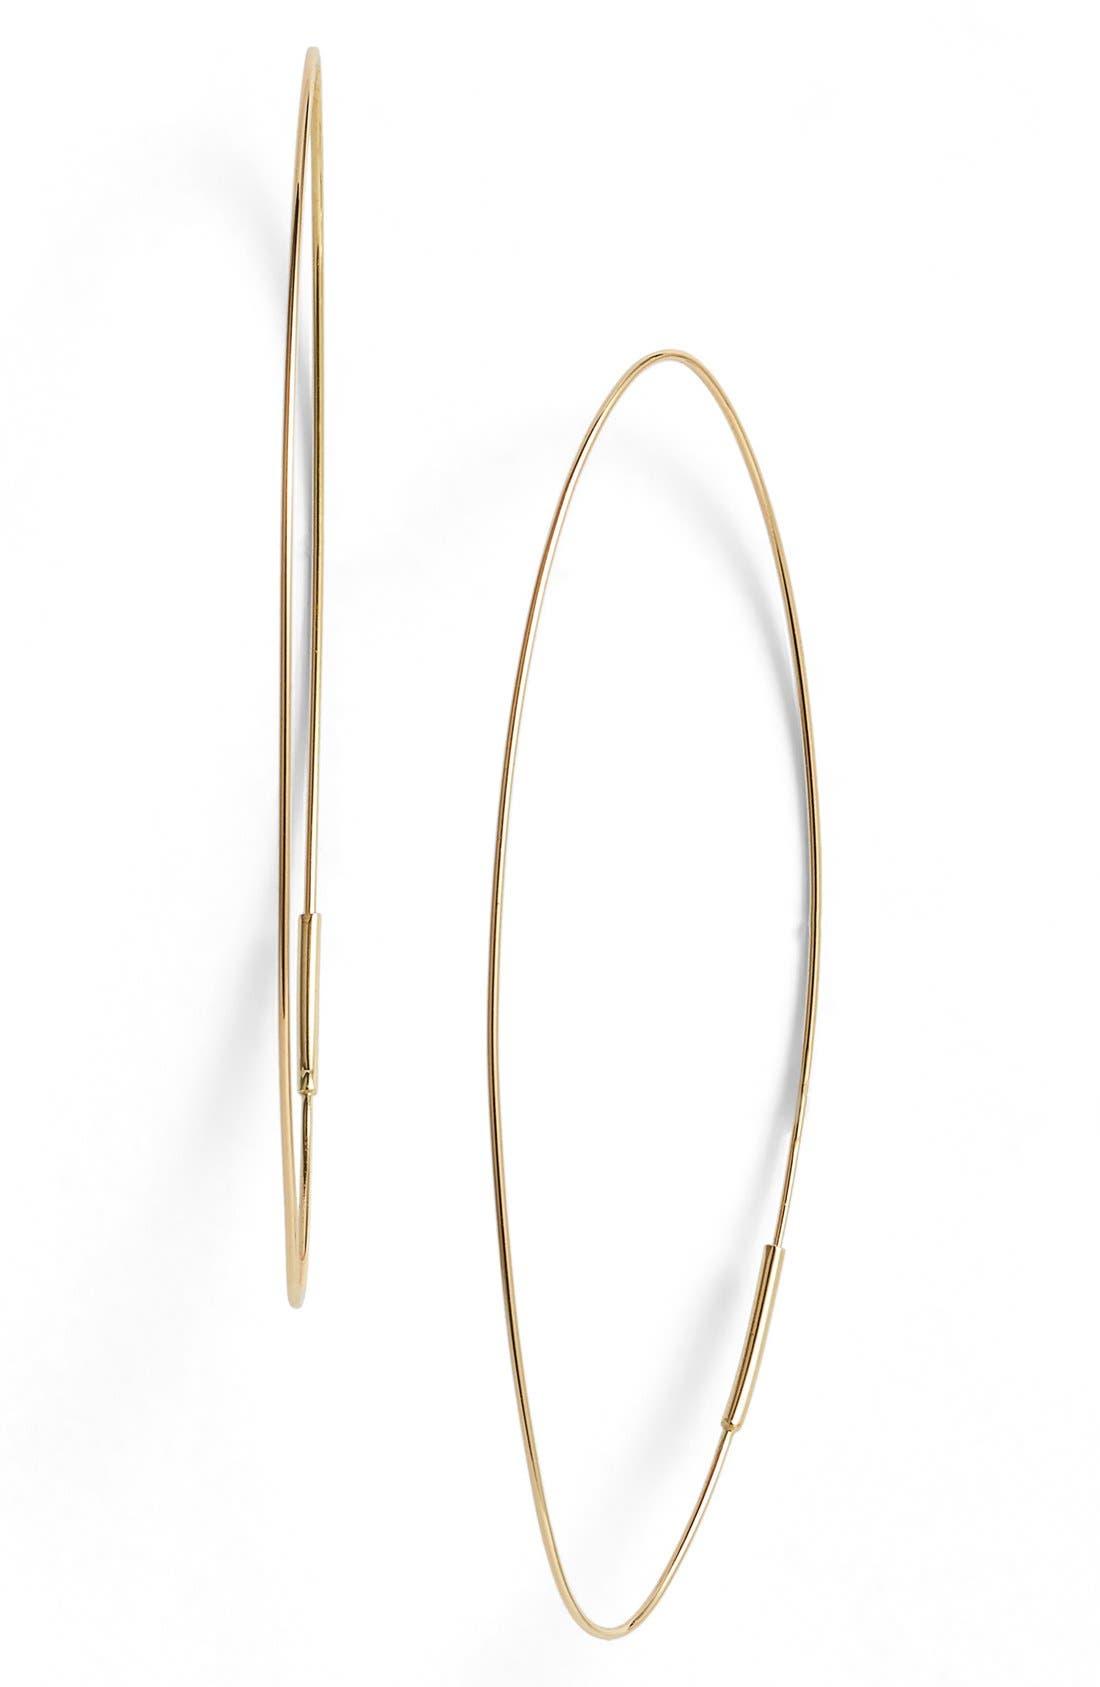 LANA JEWELRY Magic Large Oval Hoop Earrings